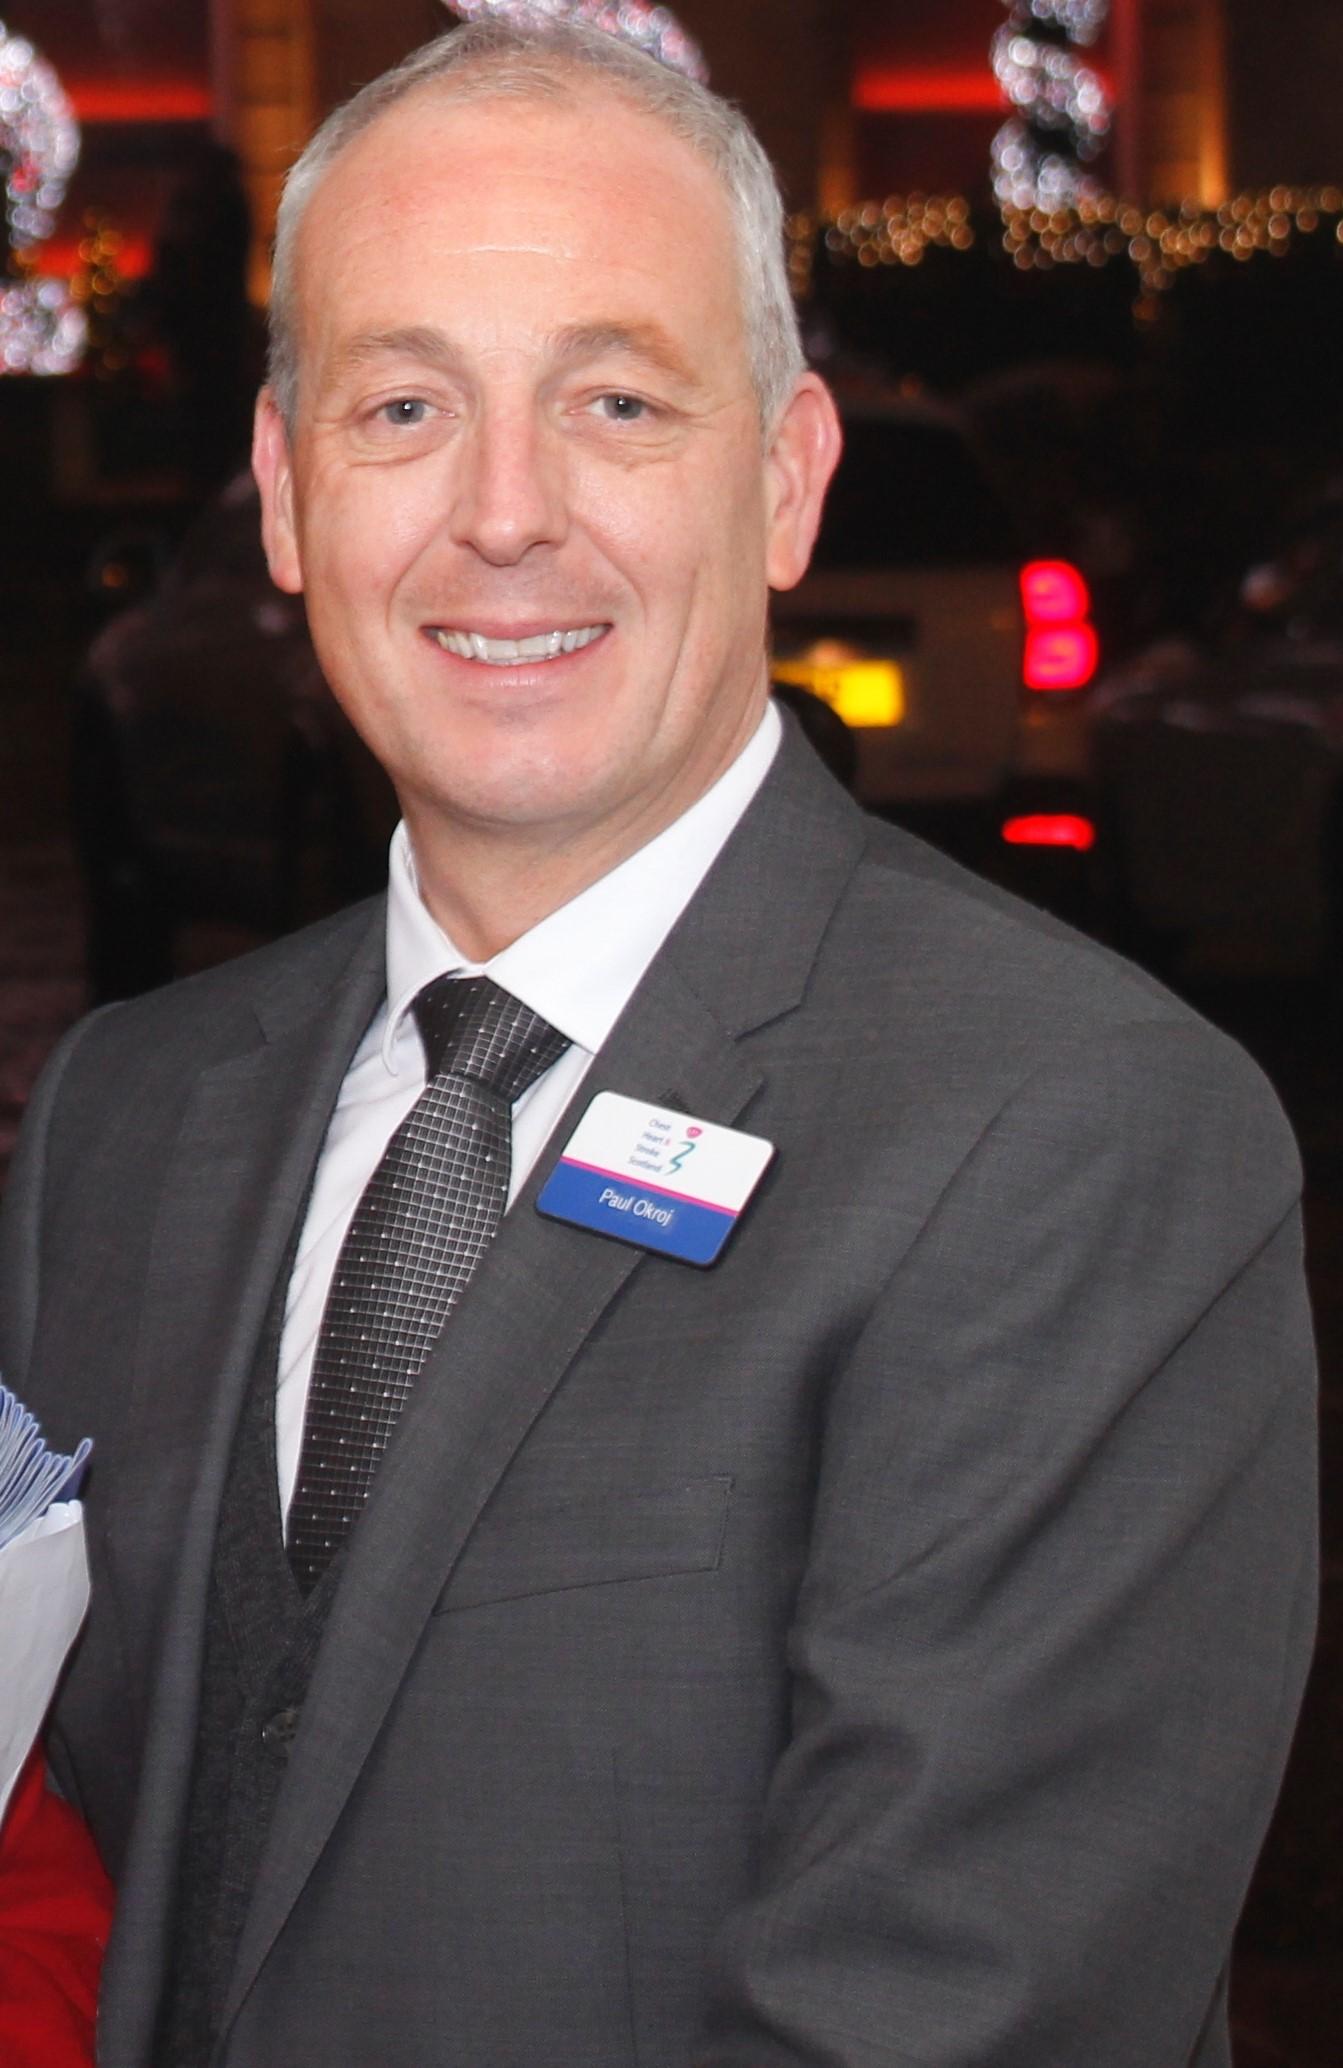 Paul Okroj